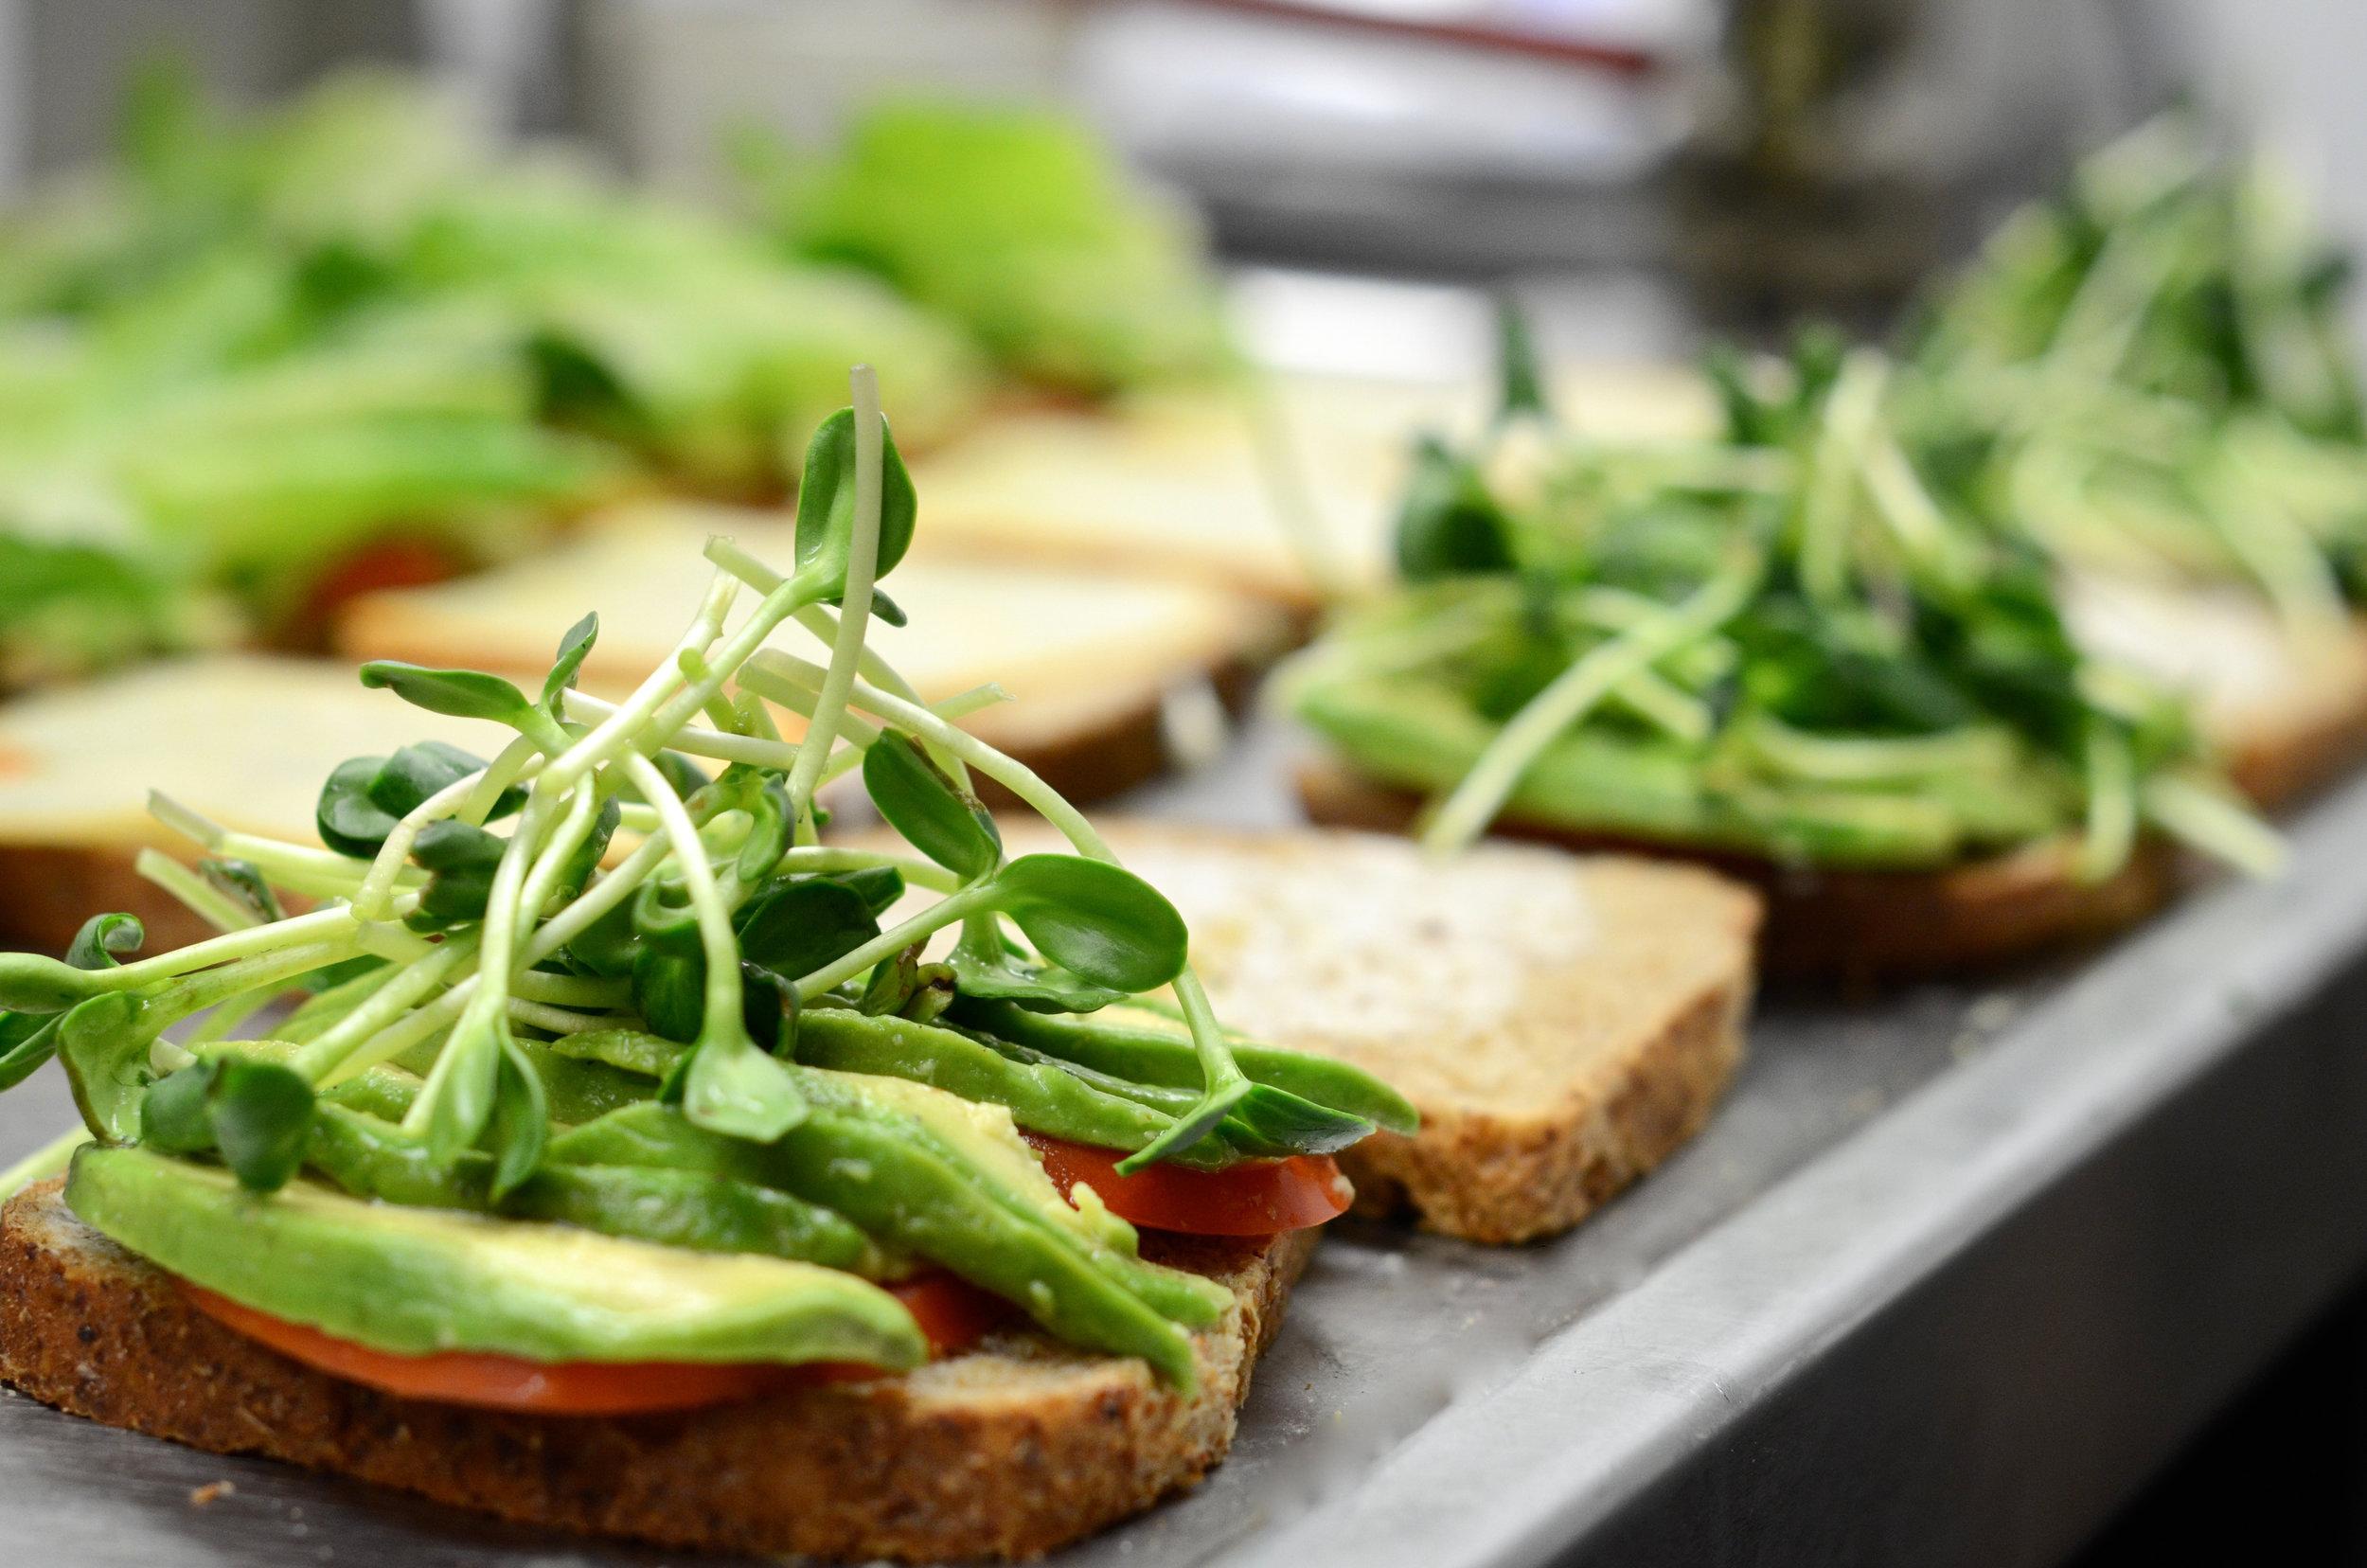 sprout sandwich copy 3.jpg L copy 2.jpg